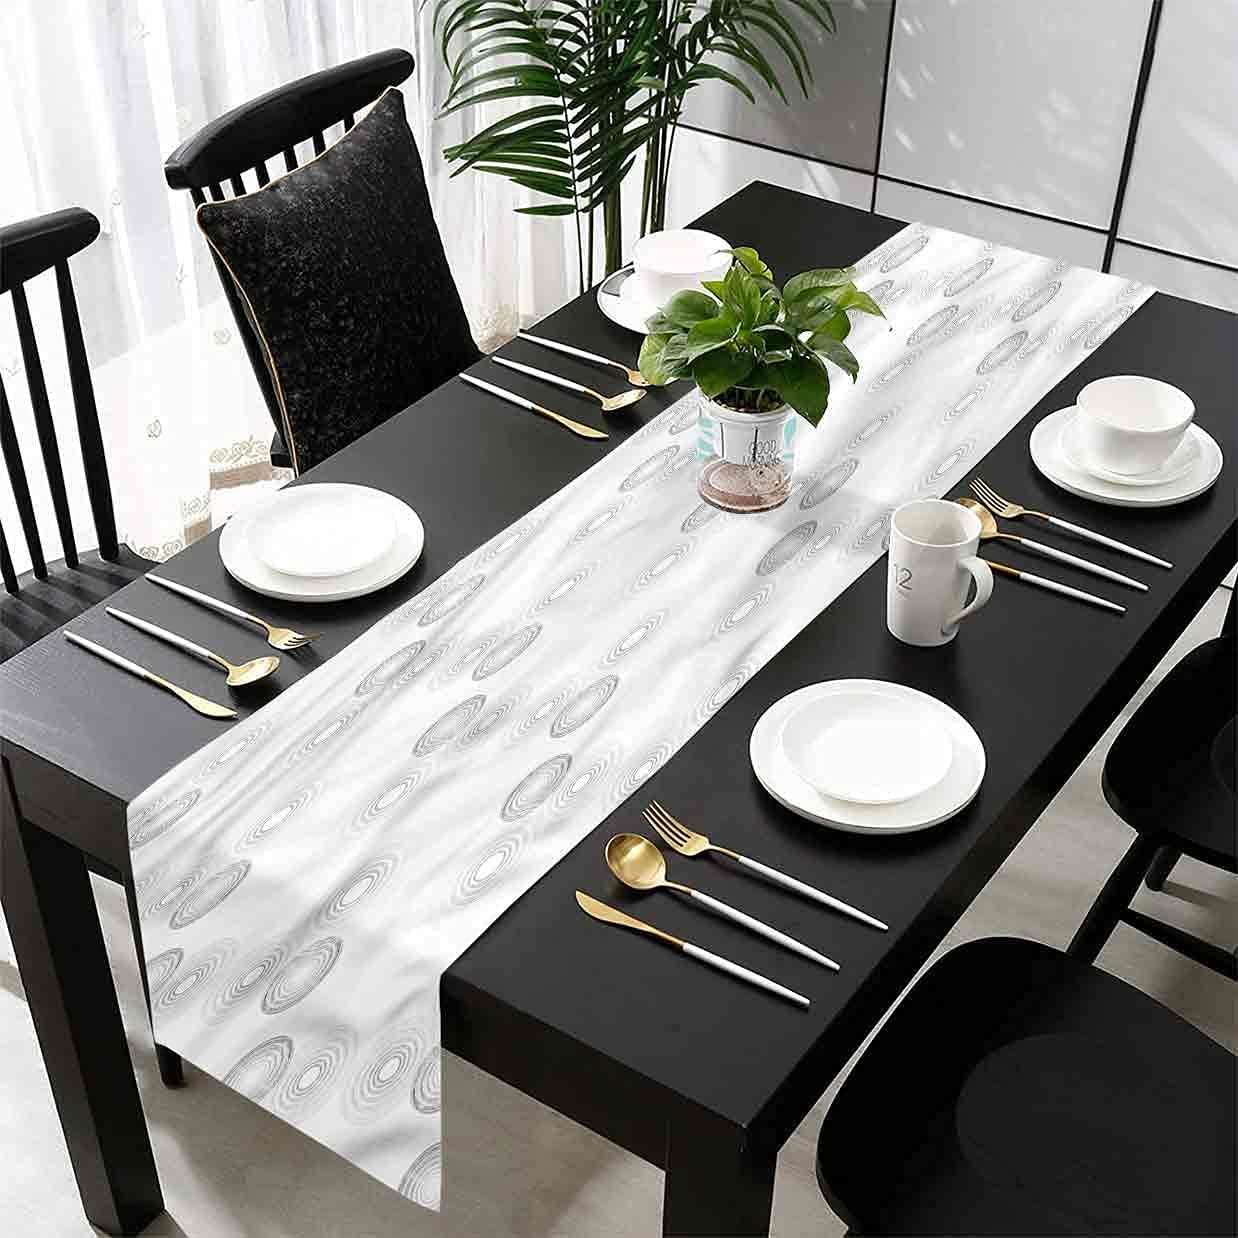 Hiiiman Grey Table Runner Bullseye Greyscale New arrival Circles Max 42% OFF Decoration